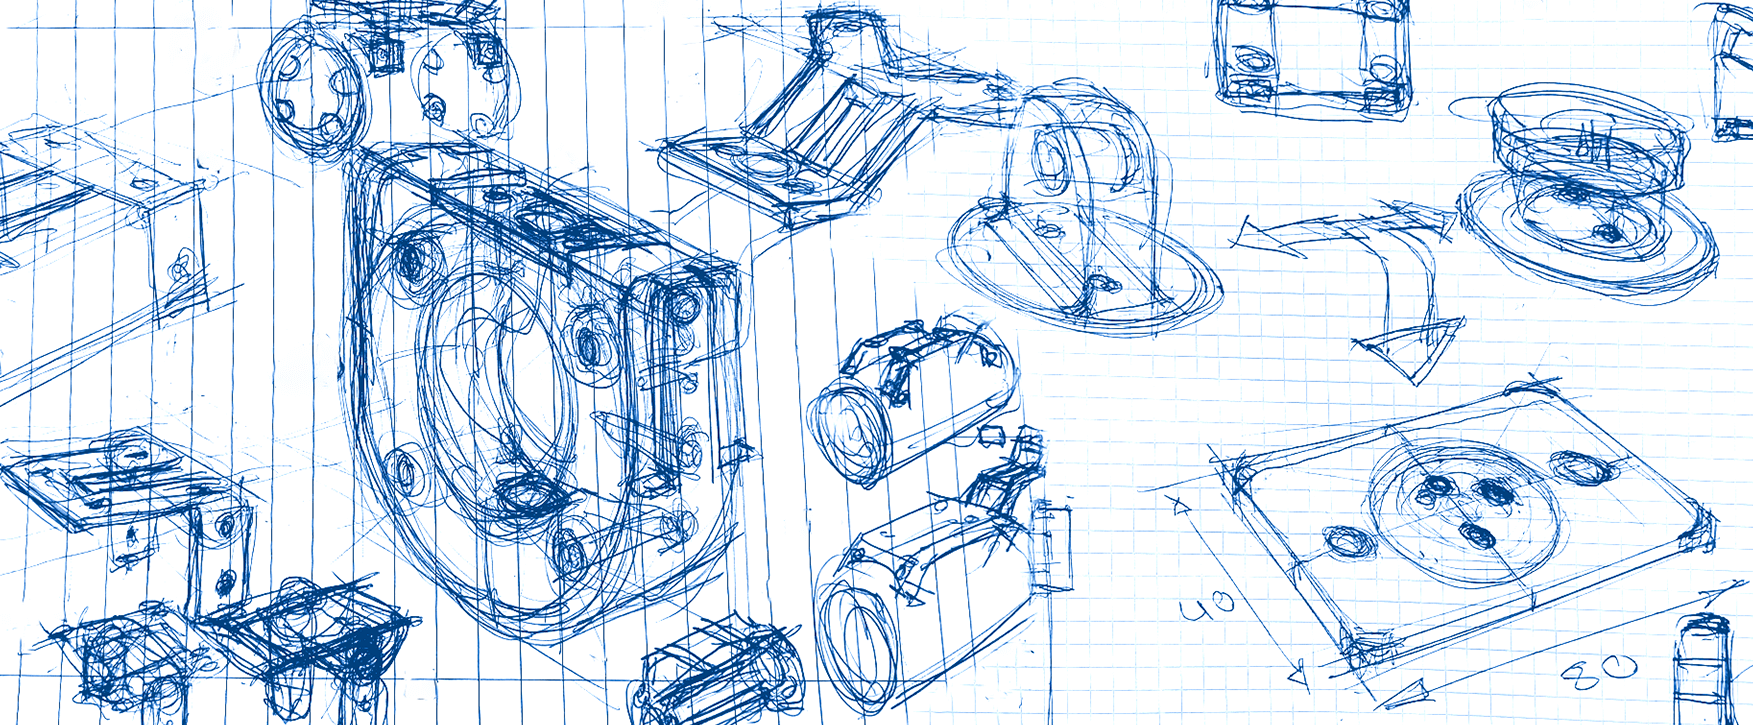 Zivid-Accessories-Family-Robot-Mount